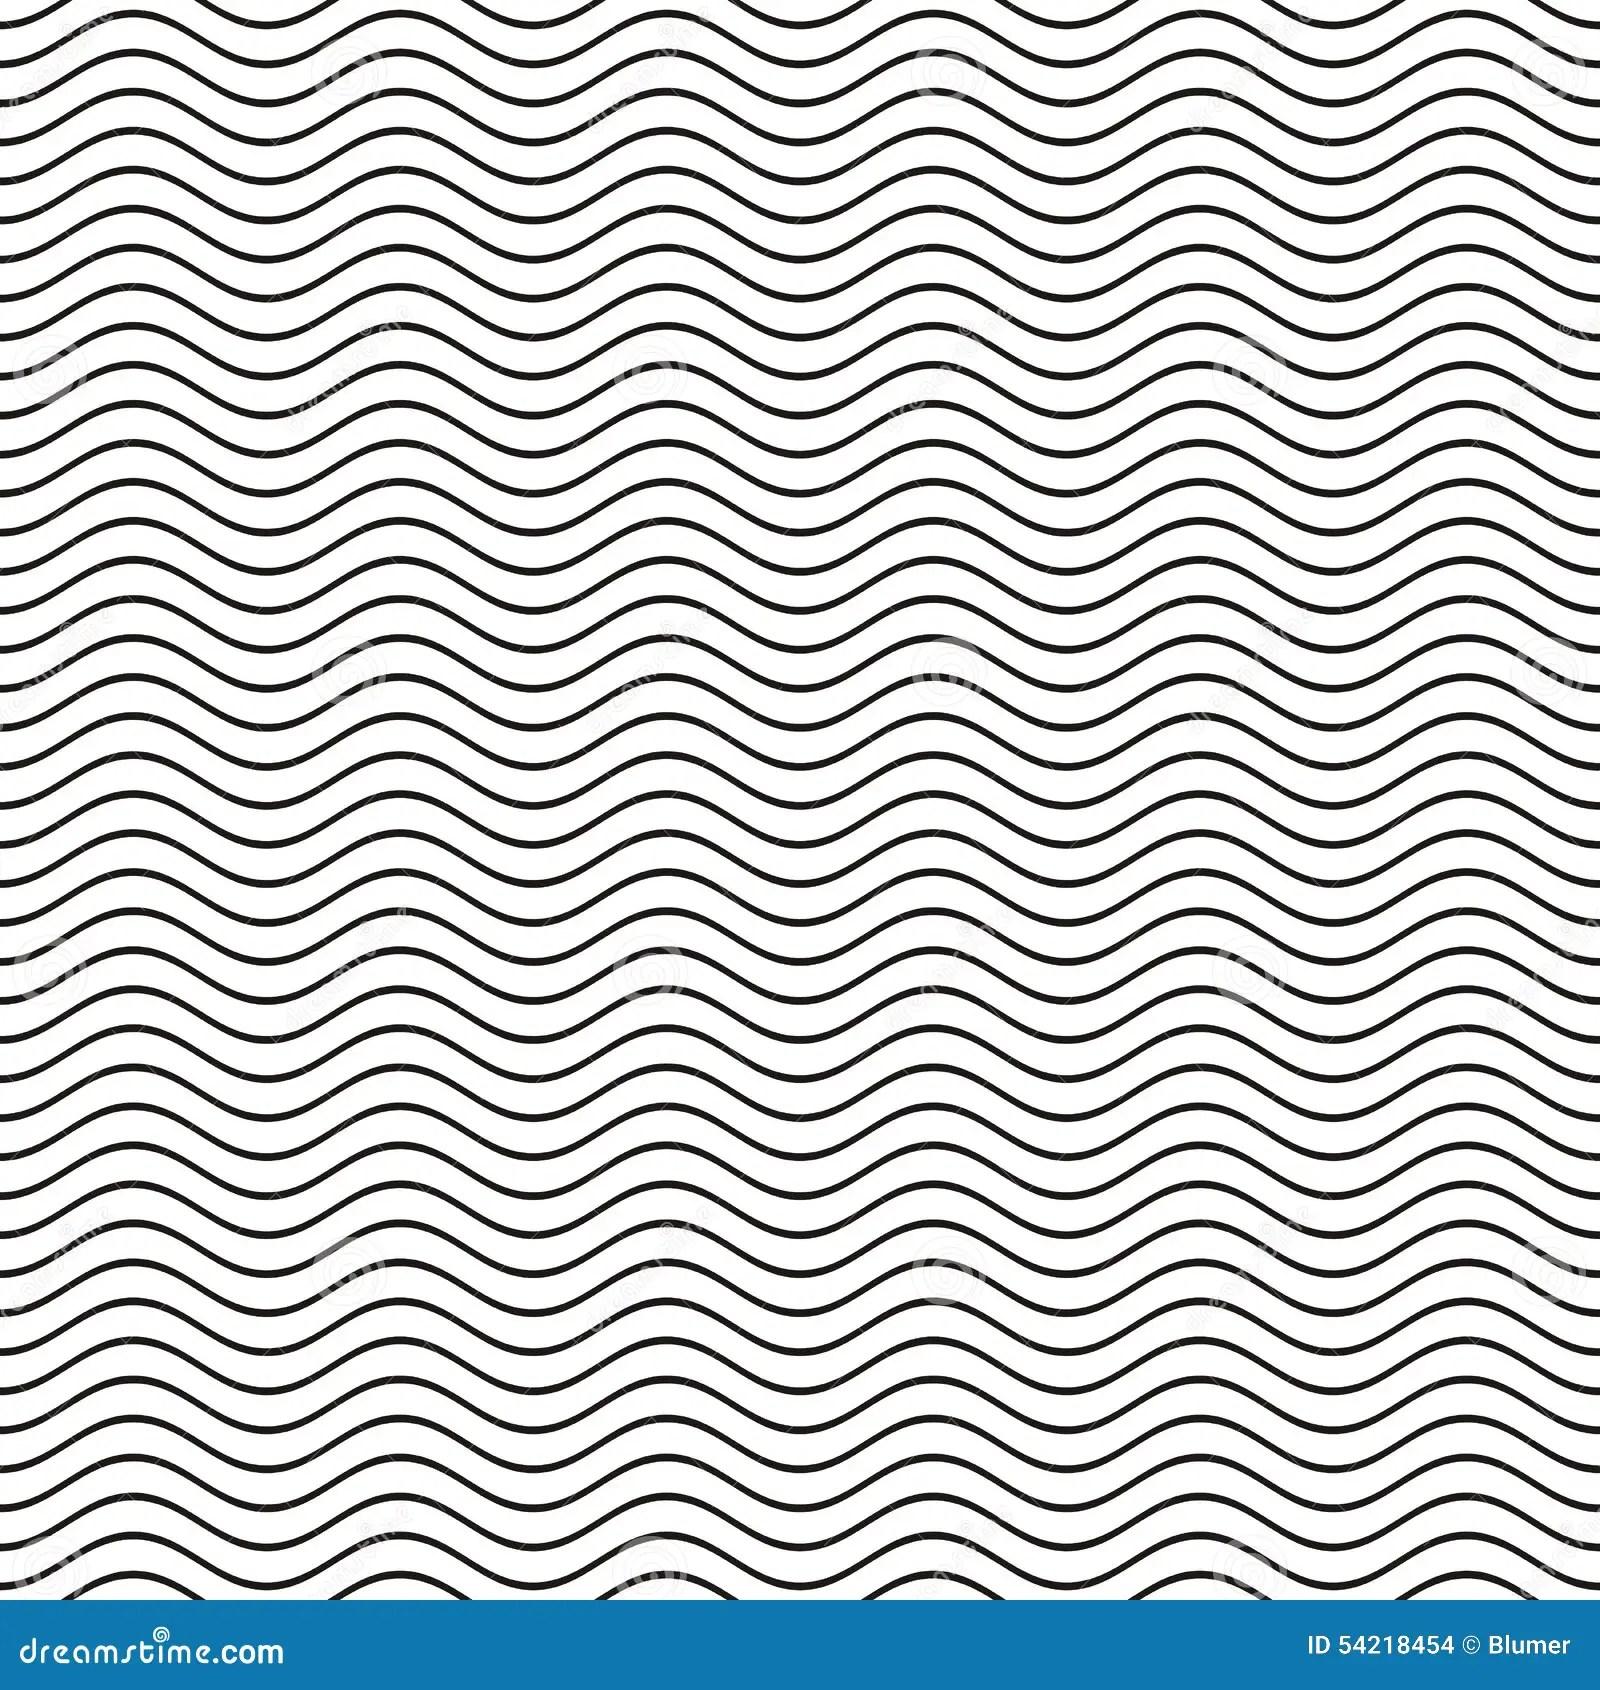 Seamless Wavy Pattern Cartoon Vector